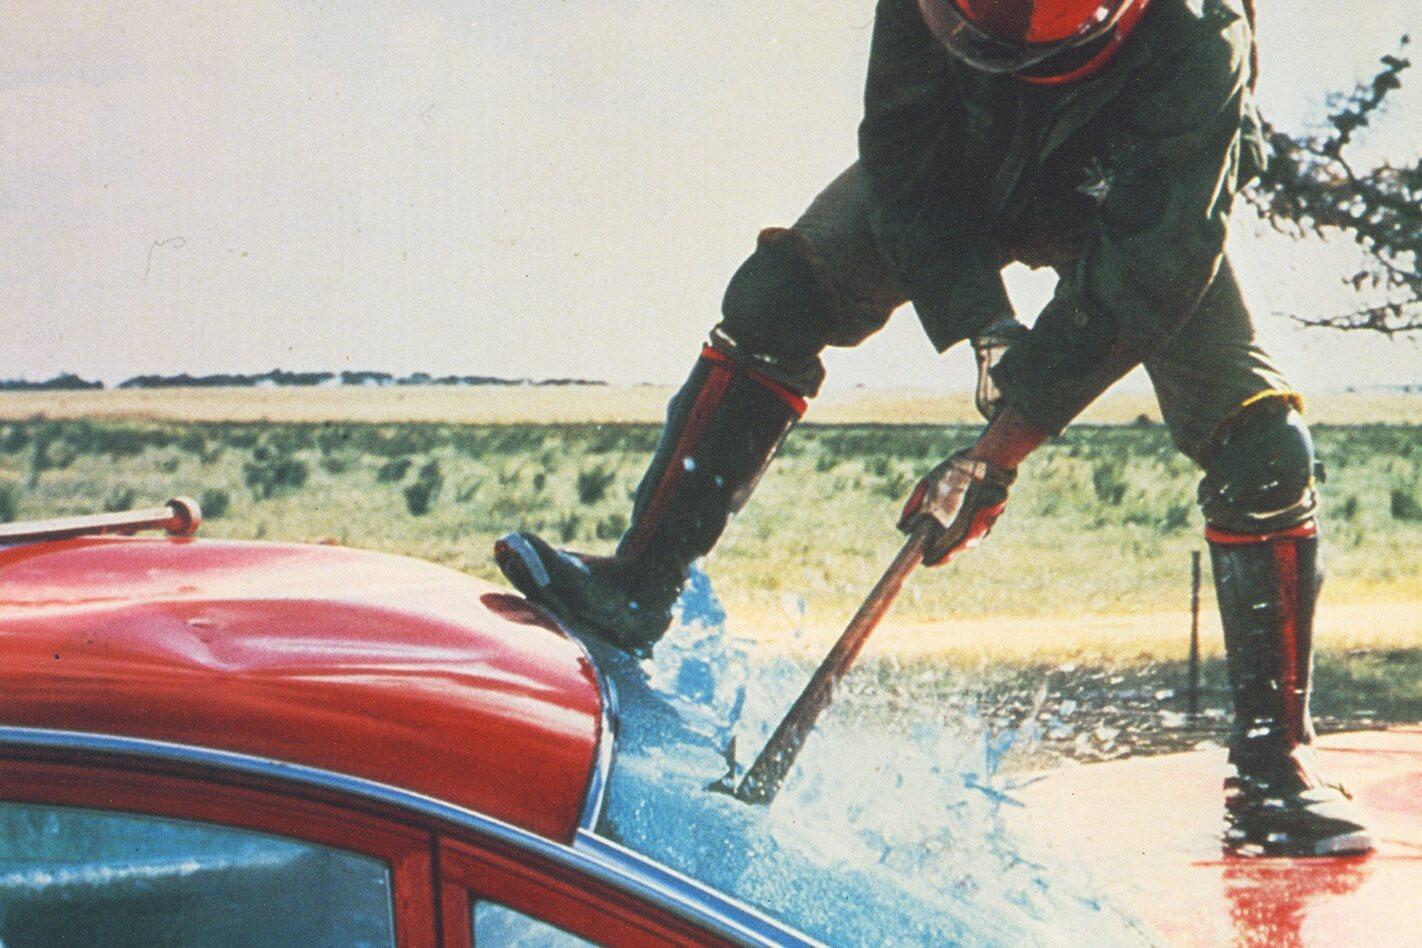 Stuntman Grant Page